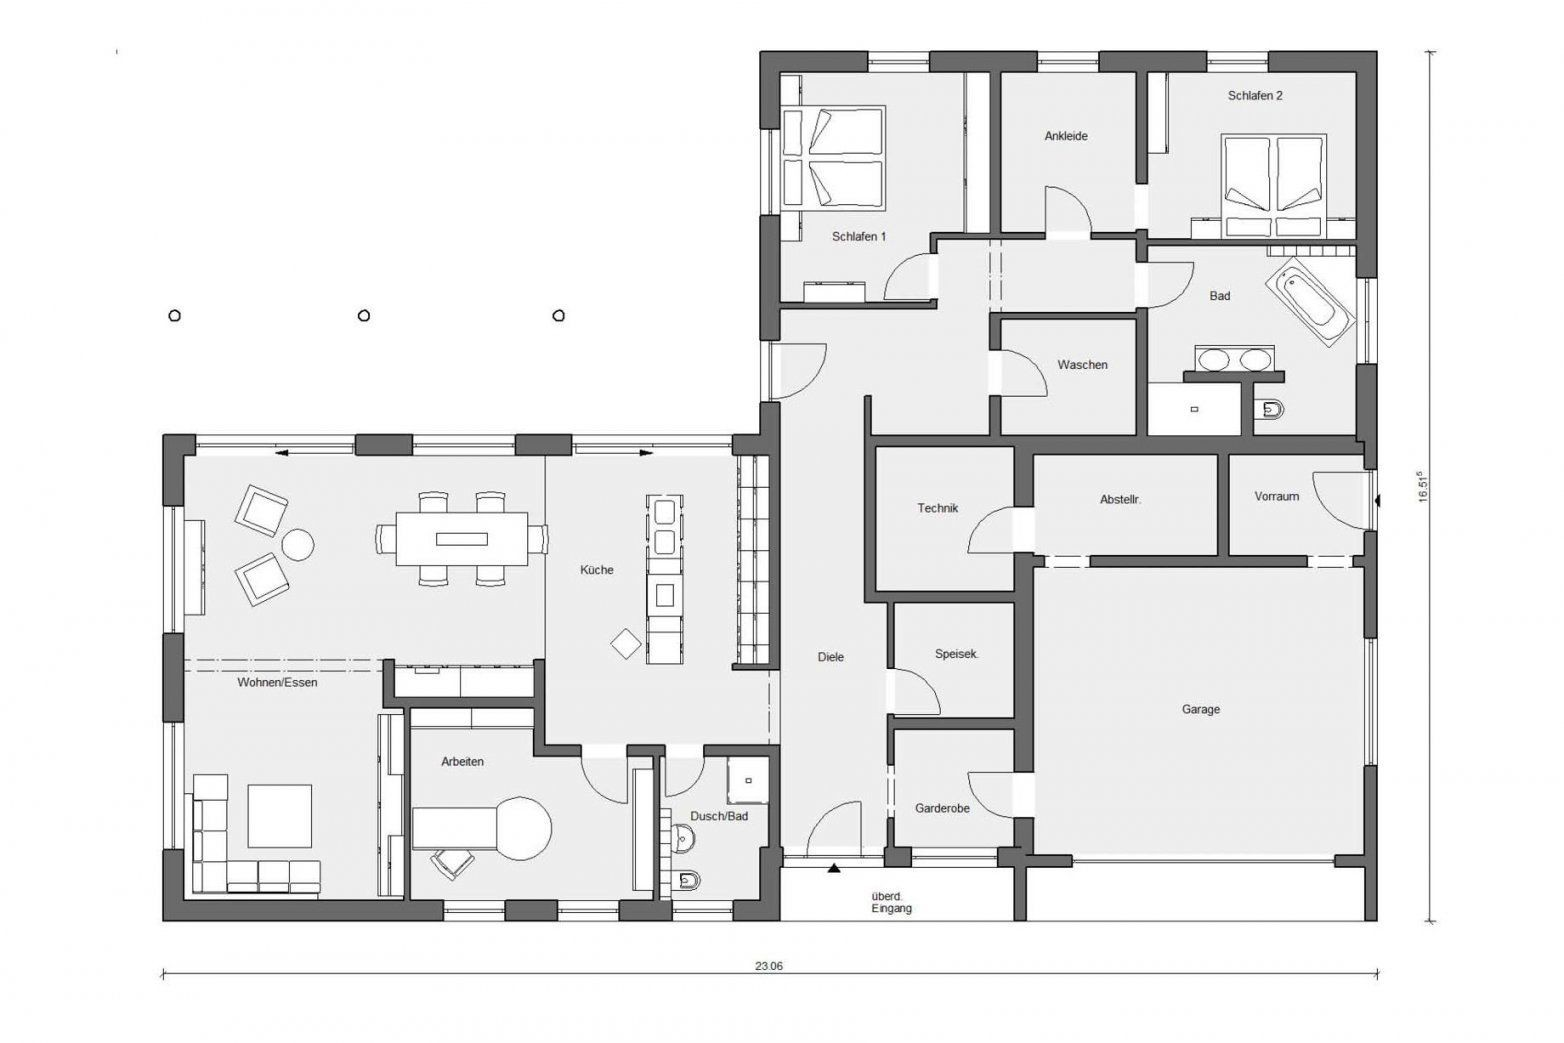 Erdgeschoss  Haus  Pinterest  Bungalow And House von Bungalow L Form Grundriss Bild